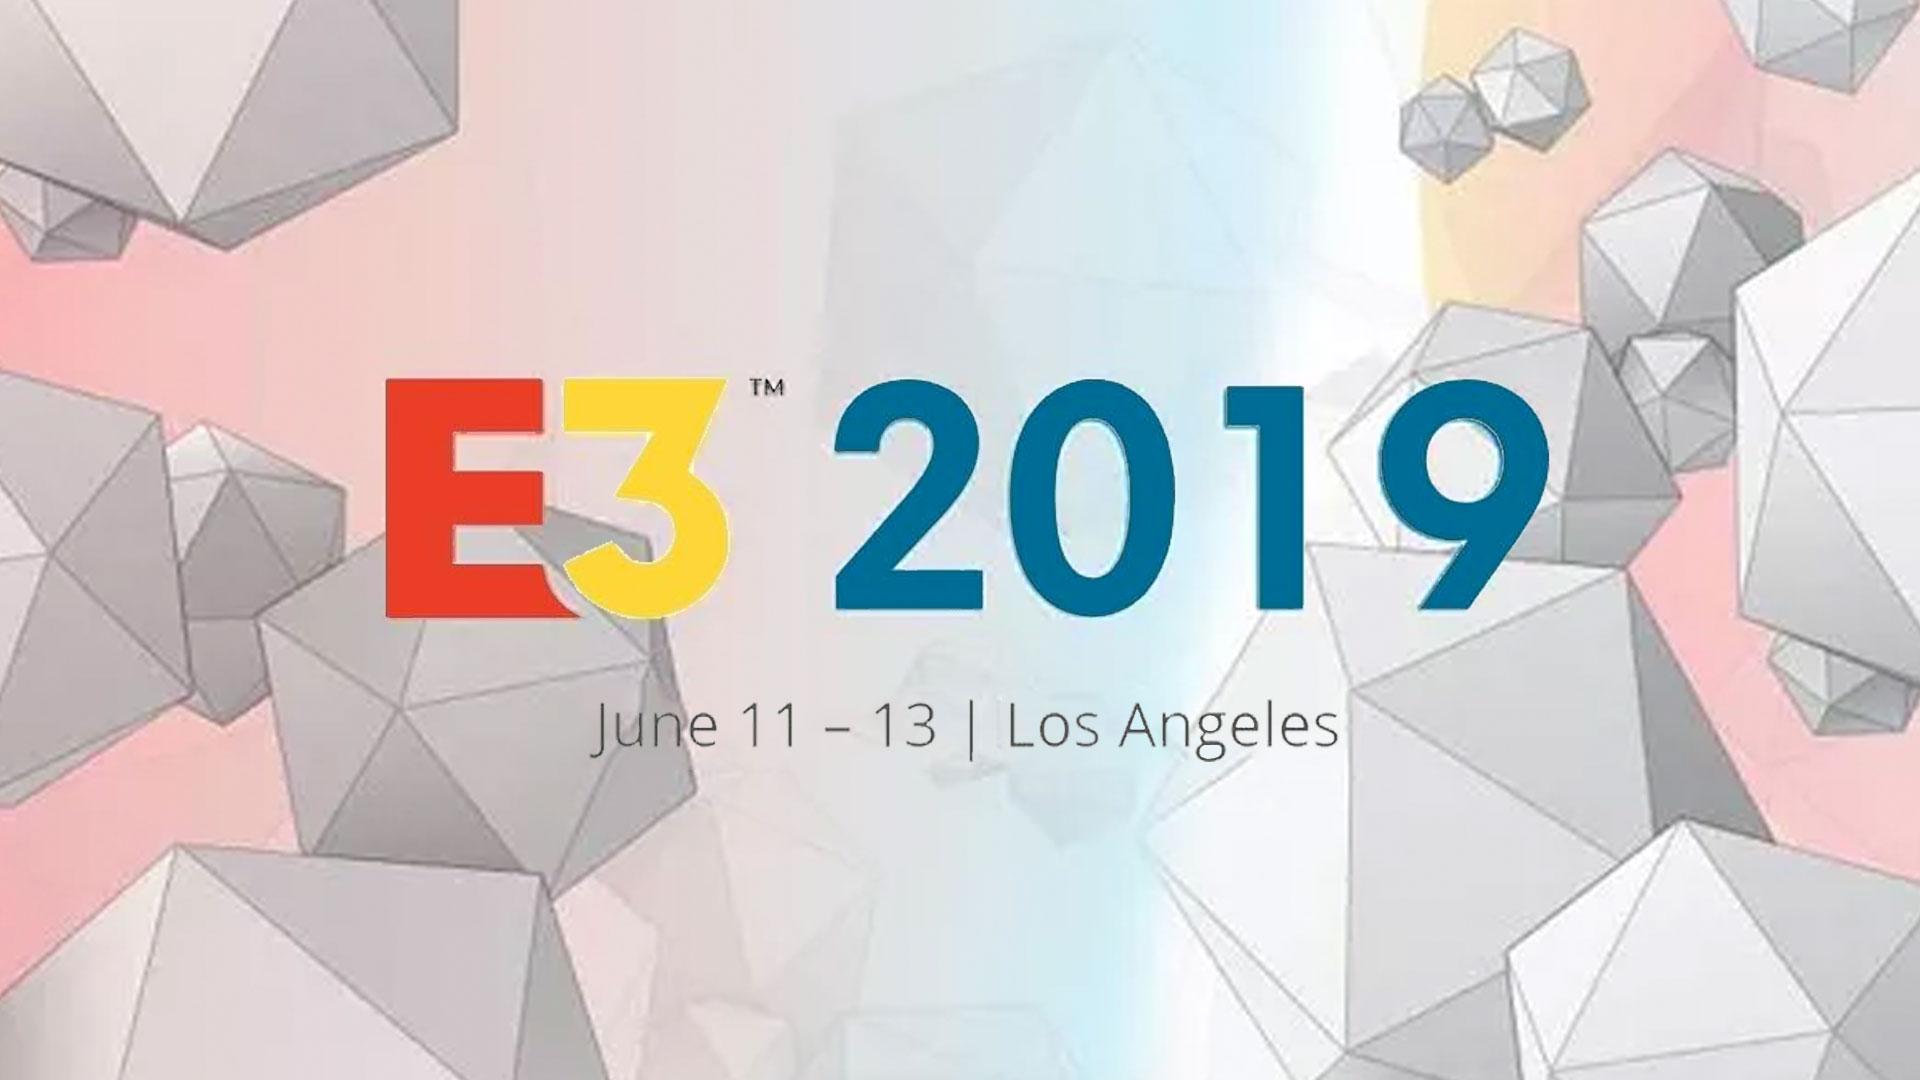 E3 2019 | دانلود کامل تمامی کنفرانسها به همراه زیرنویس [بهروزرسانی نینتندو-استیدیا]